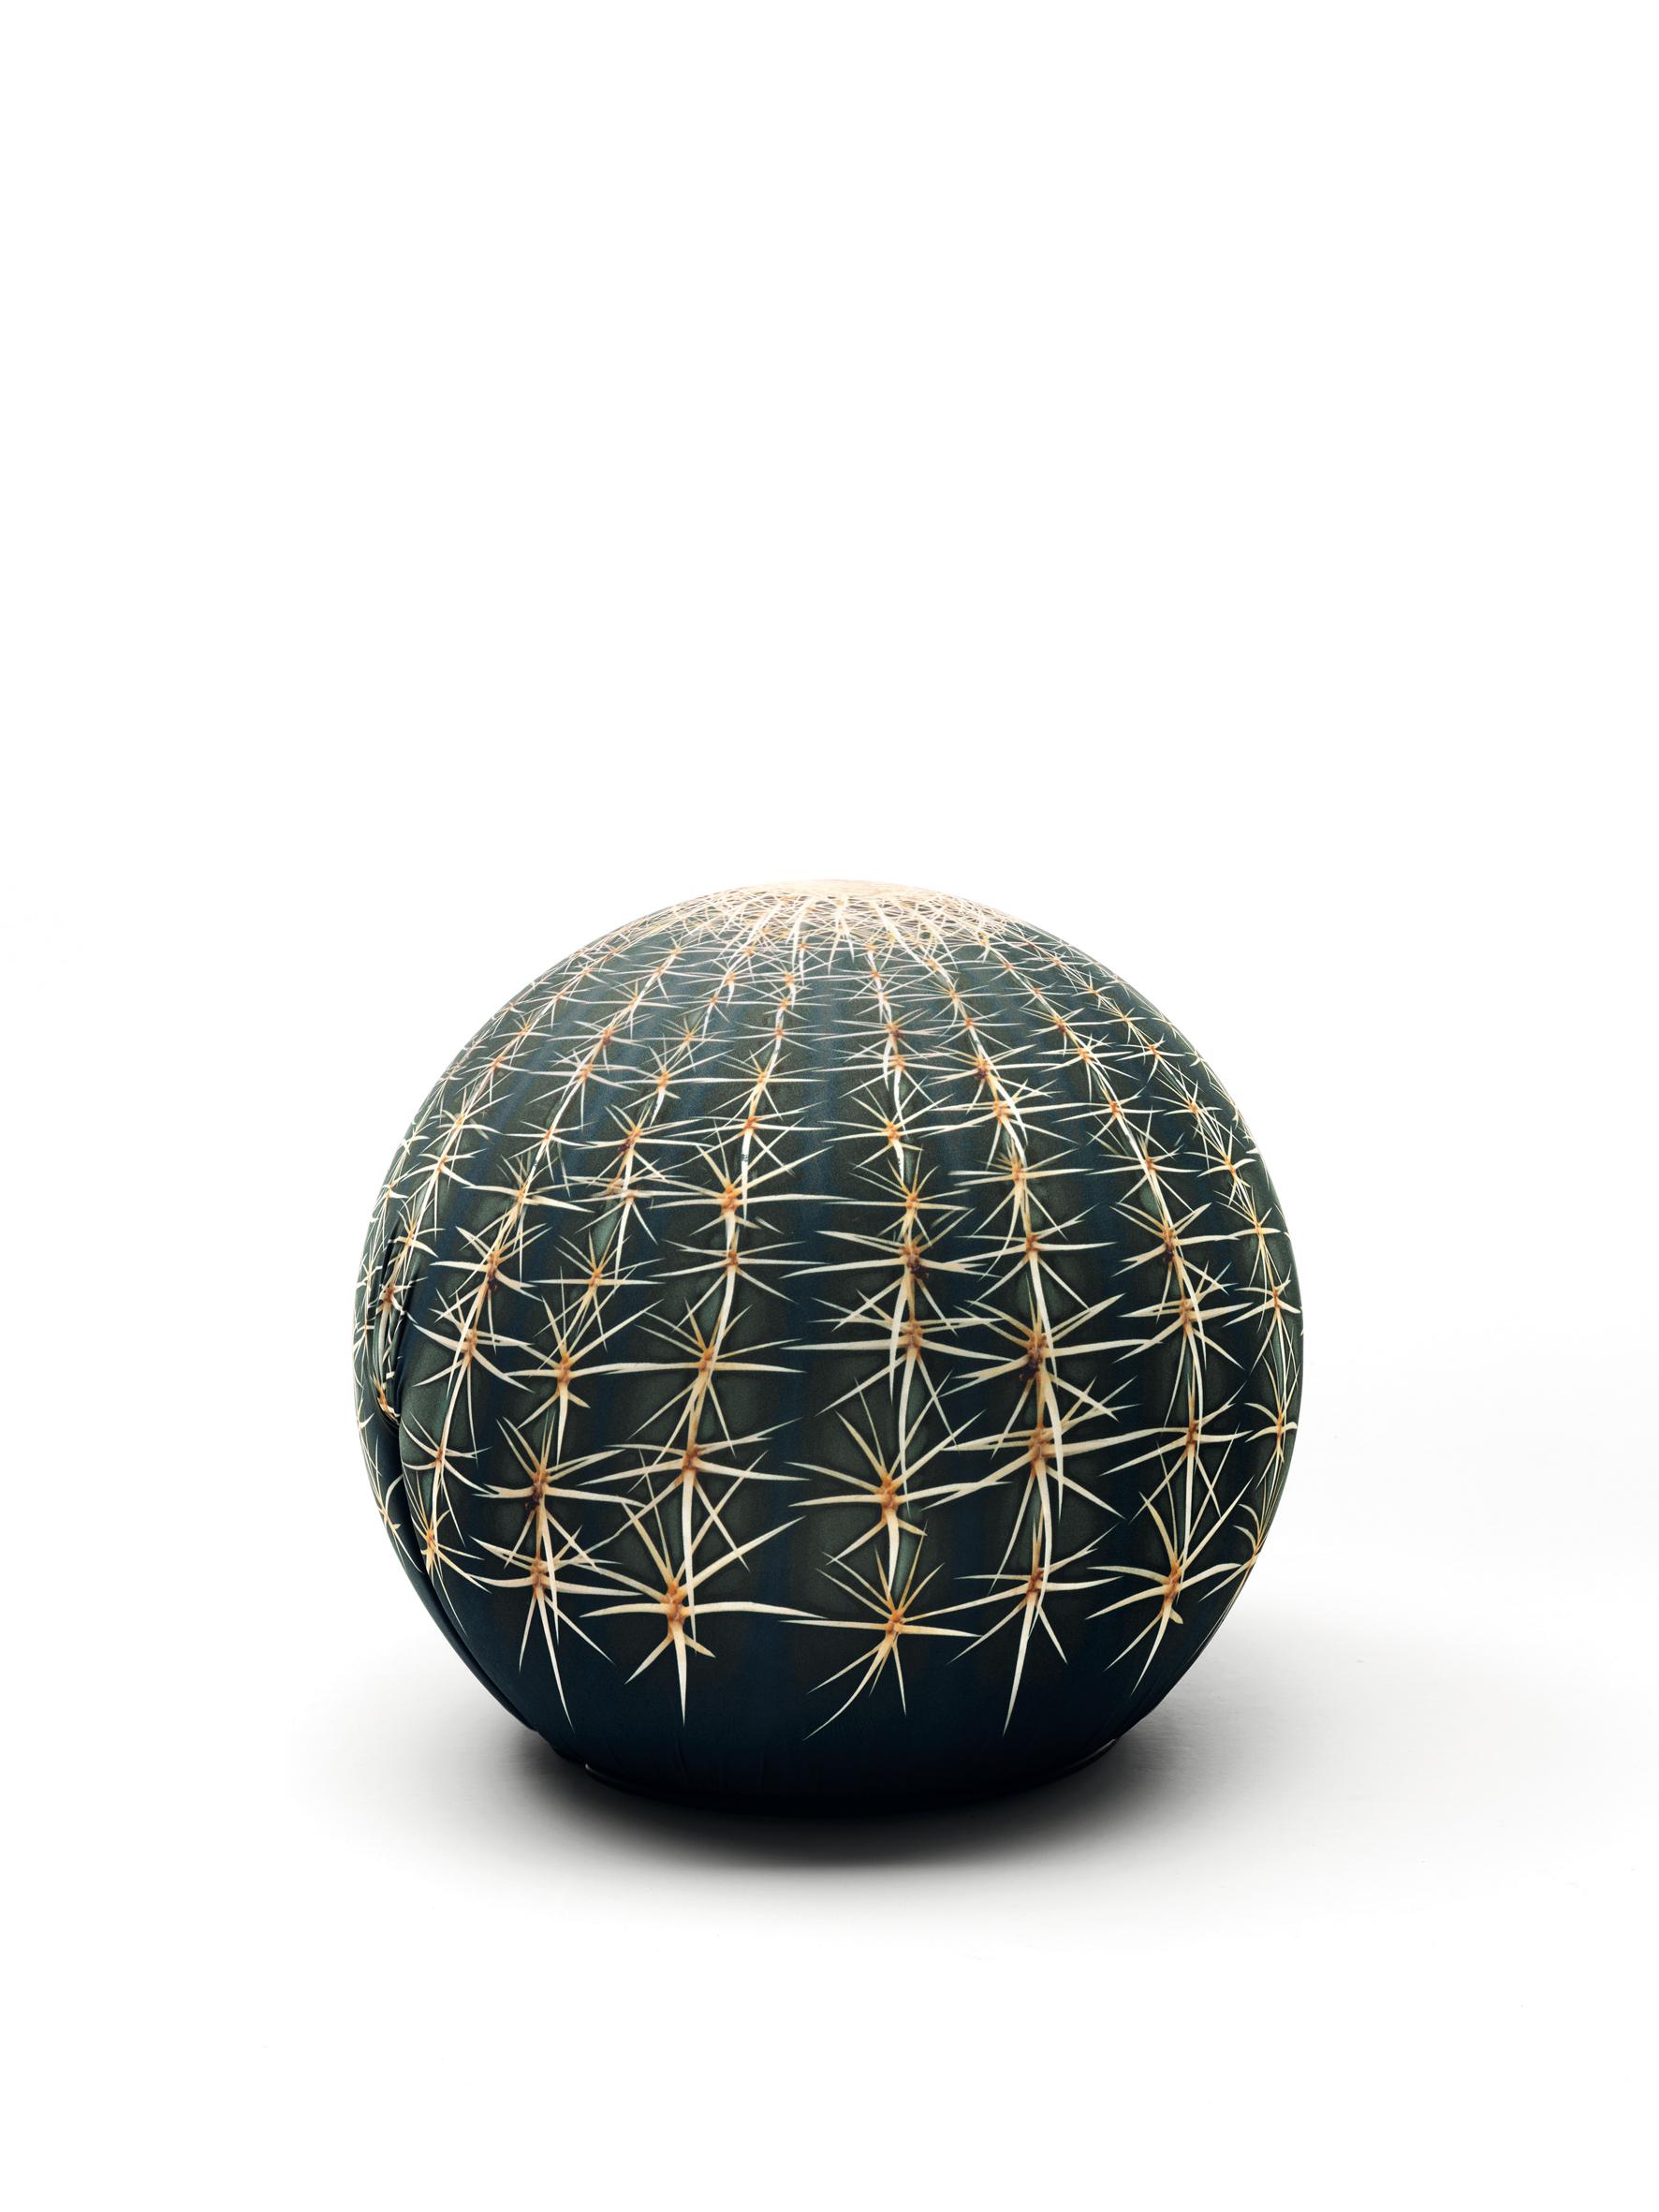 CERRUTI BALERI  2011 fuorisalone preview venus  cactus